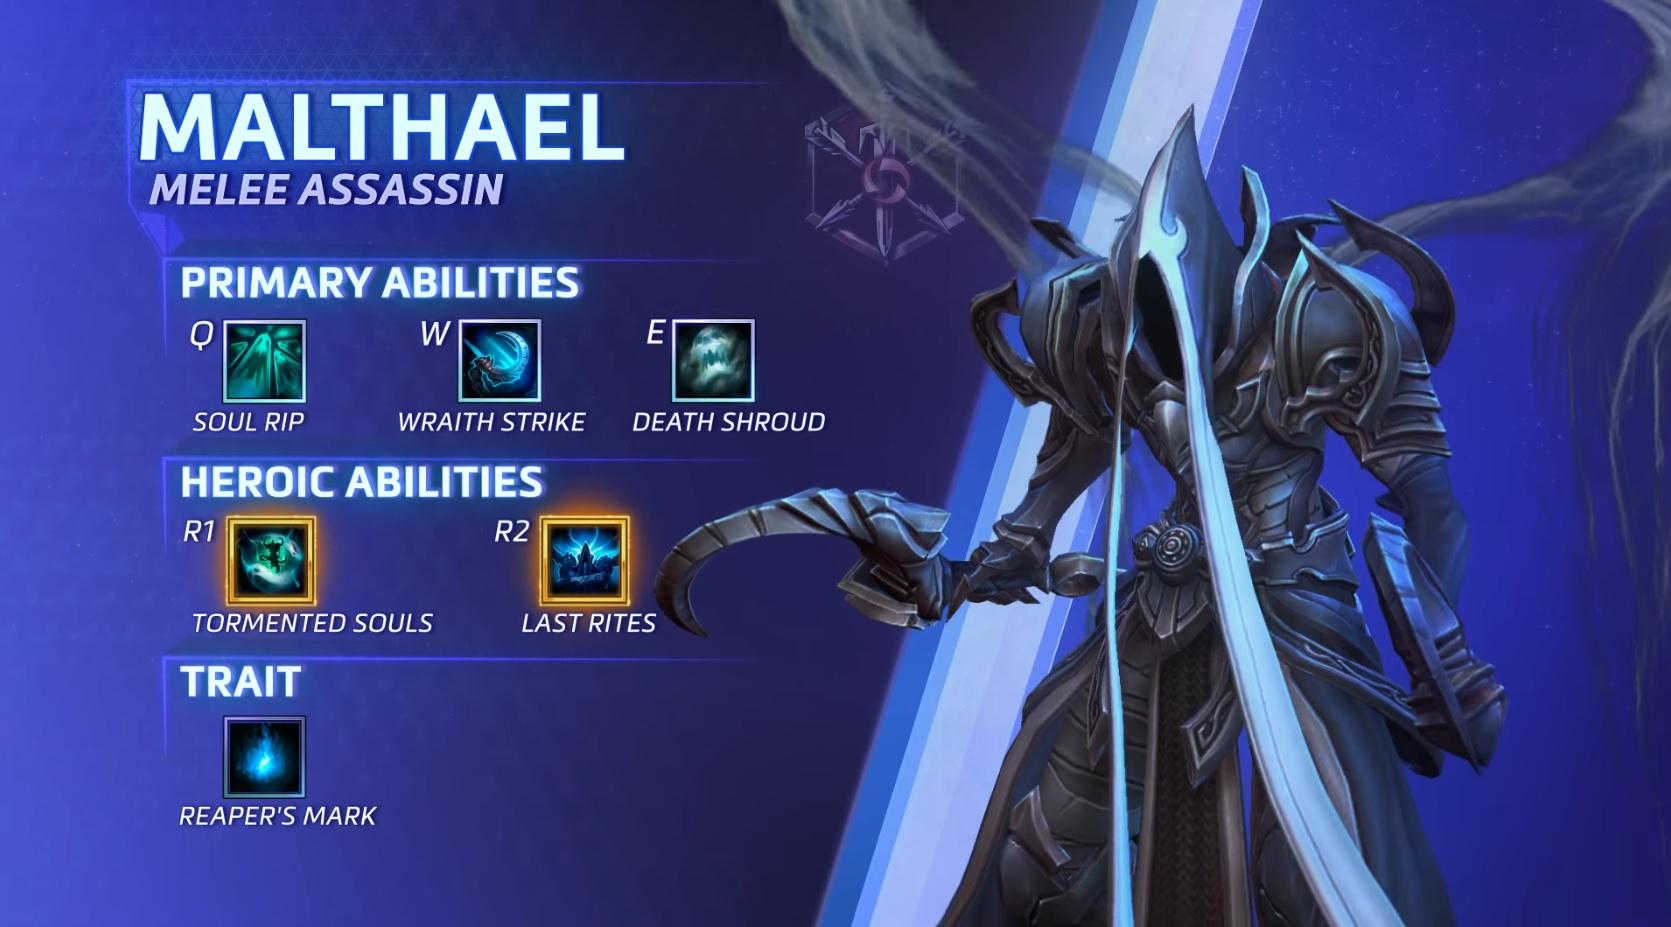 HotS Malthael Abilities